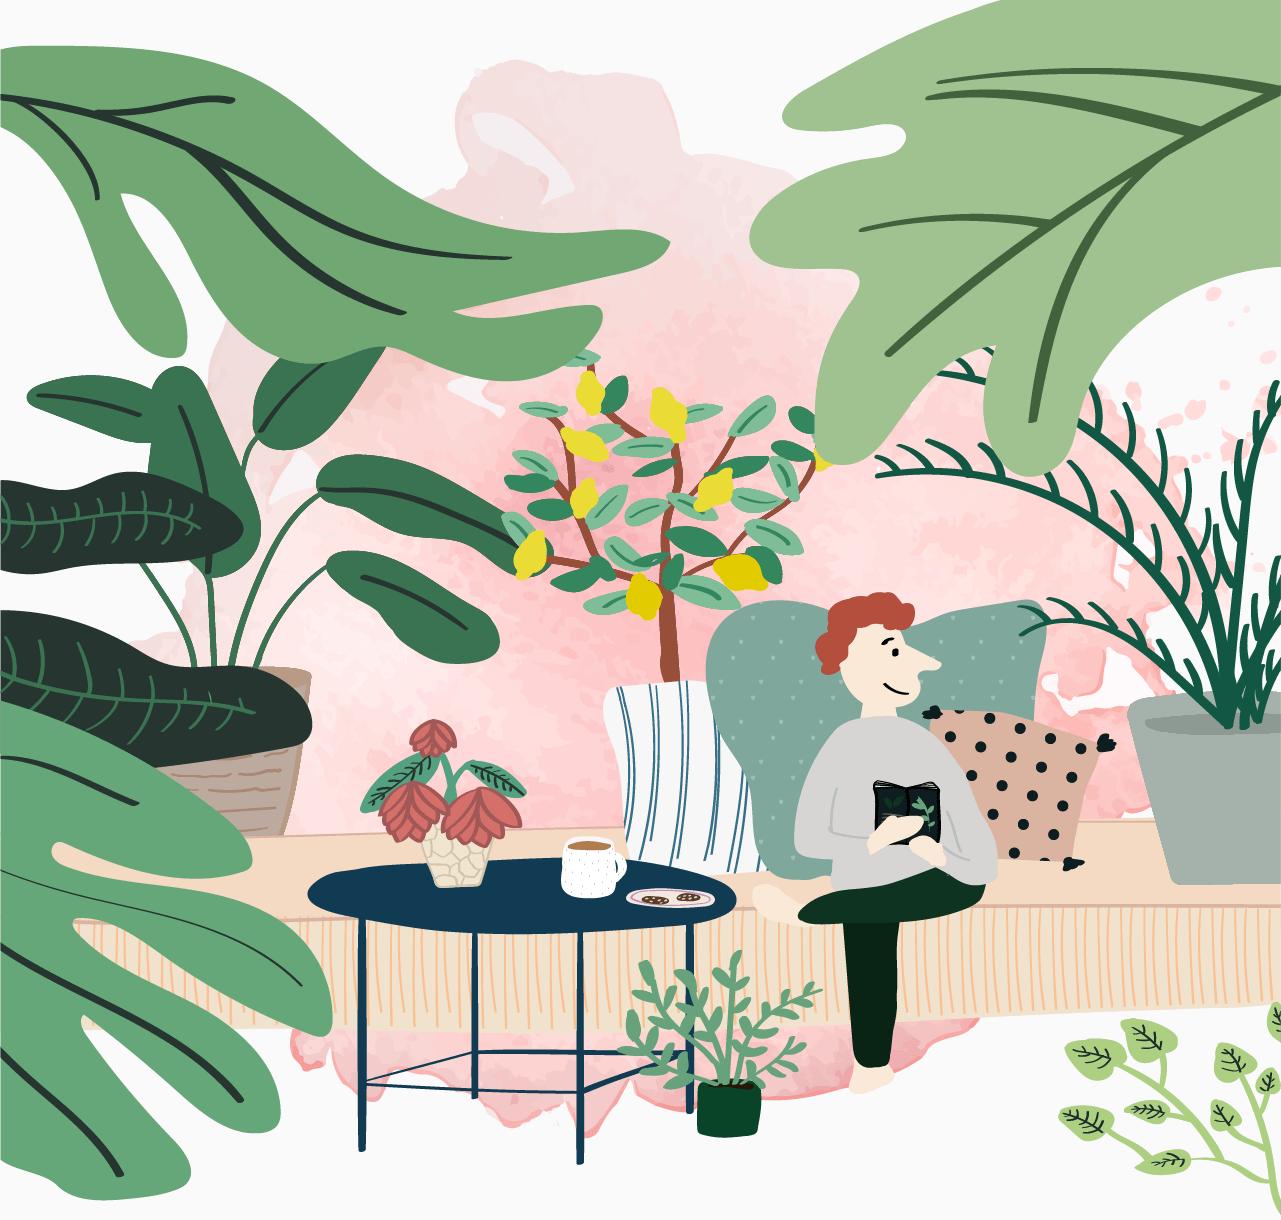 Illustration of using plants